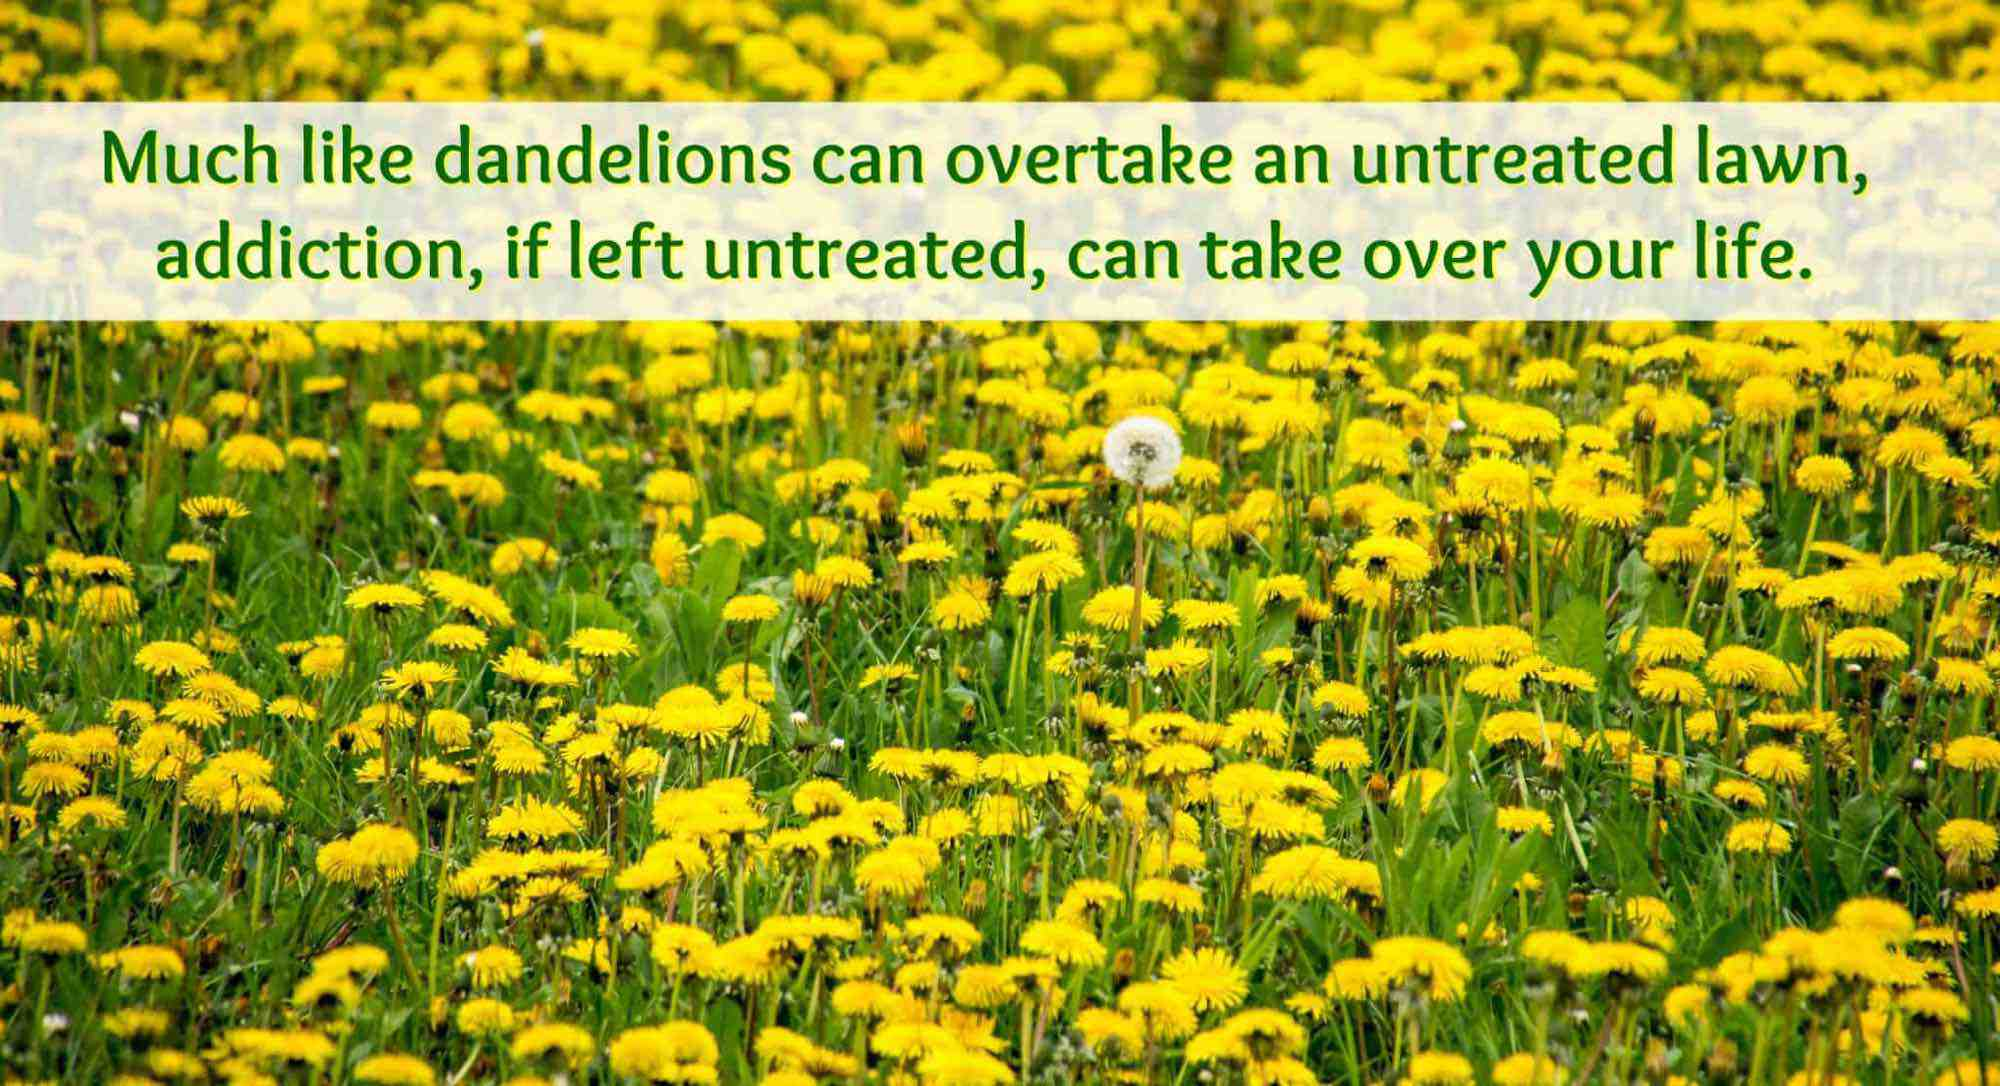 Dandelions overtaking a lawn.